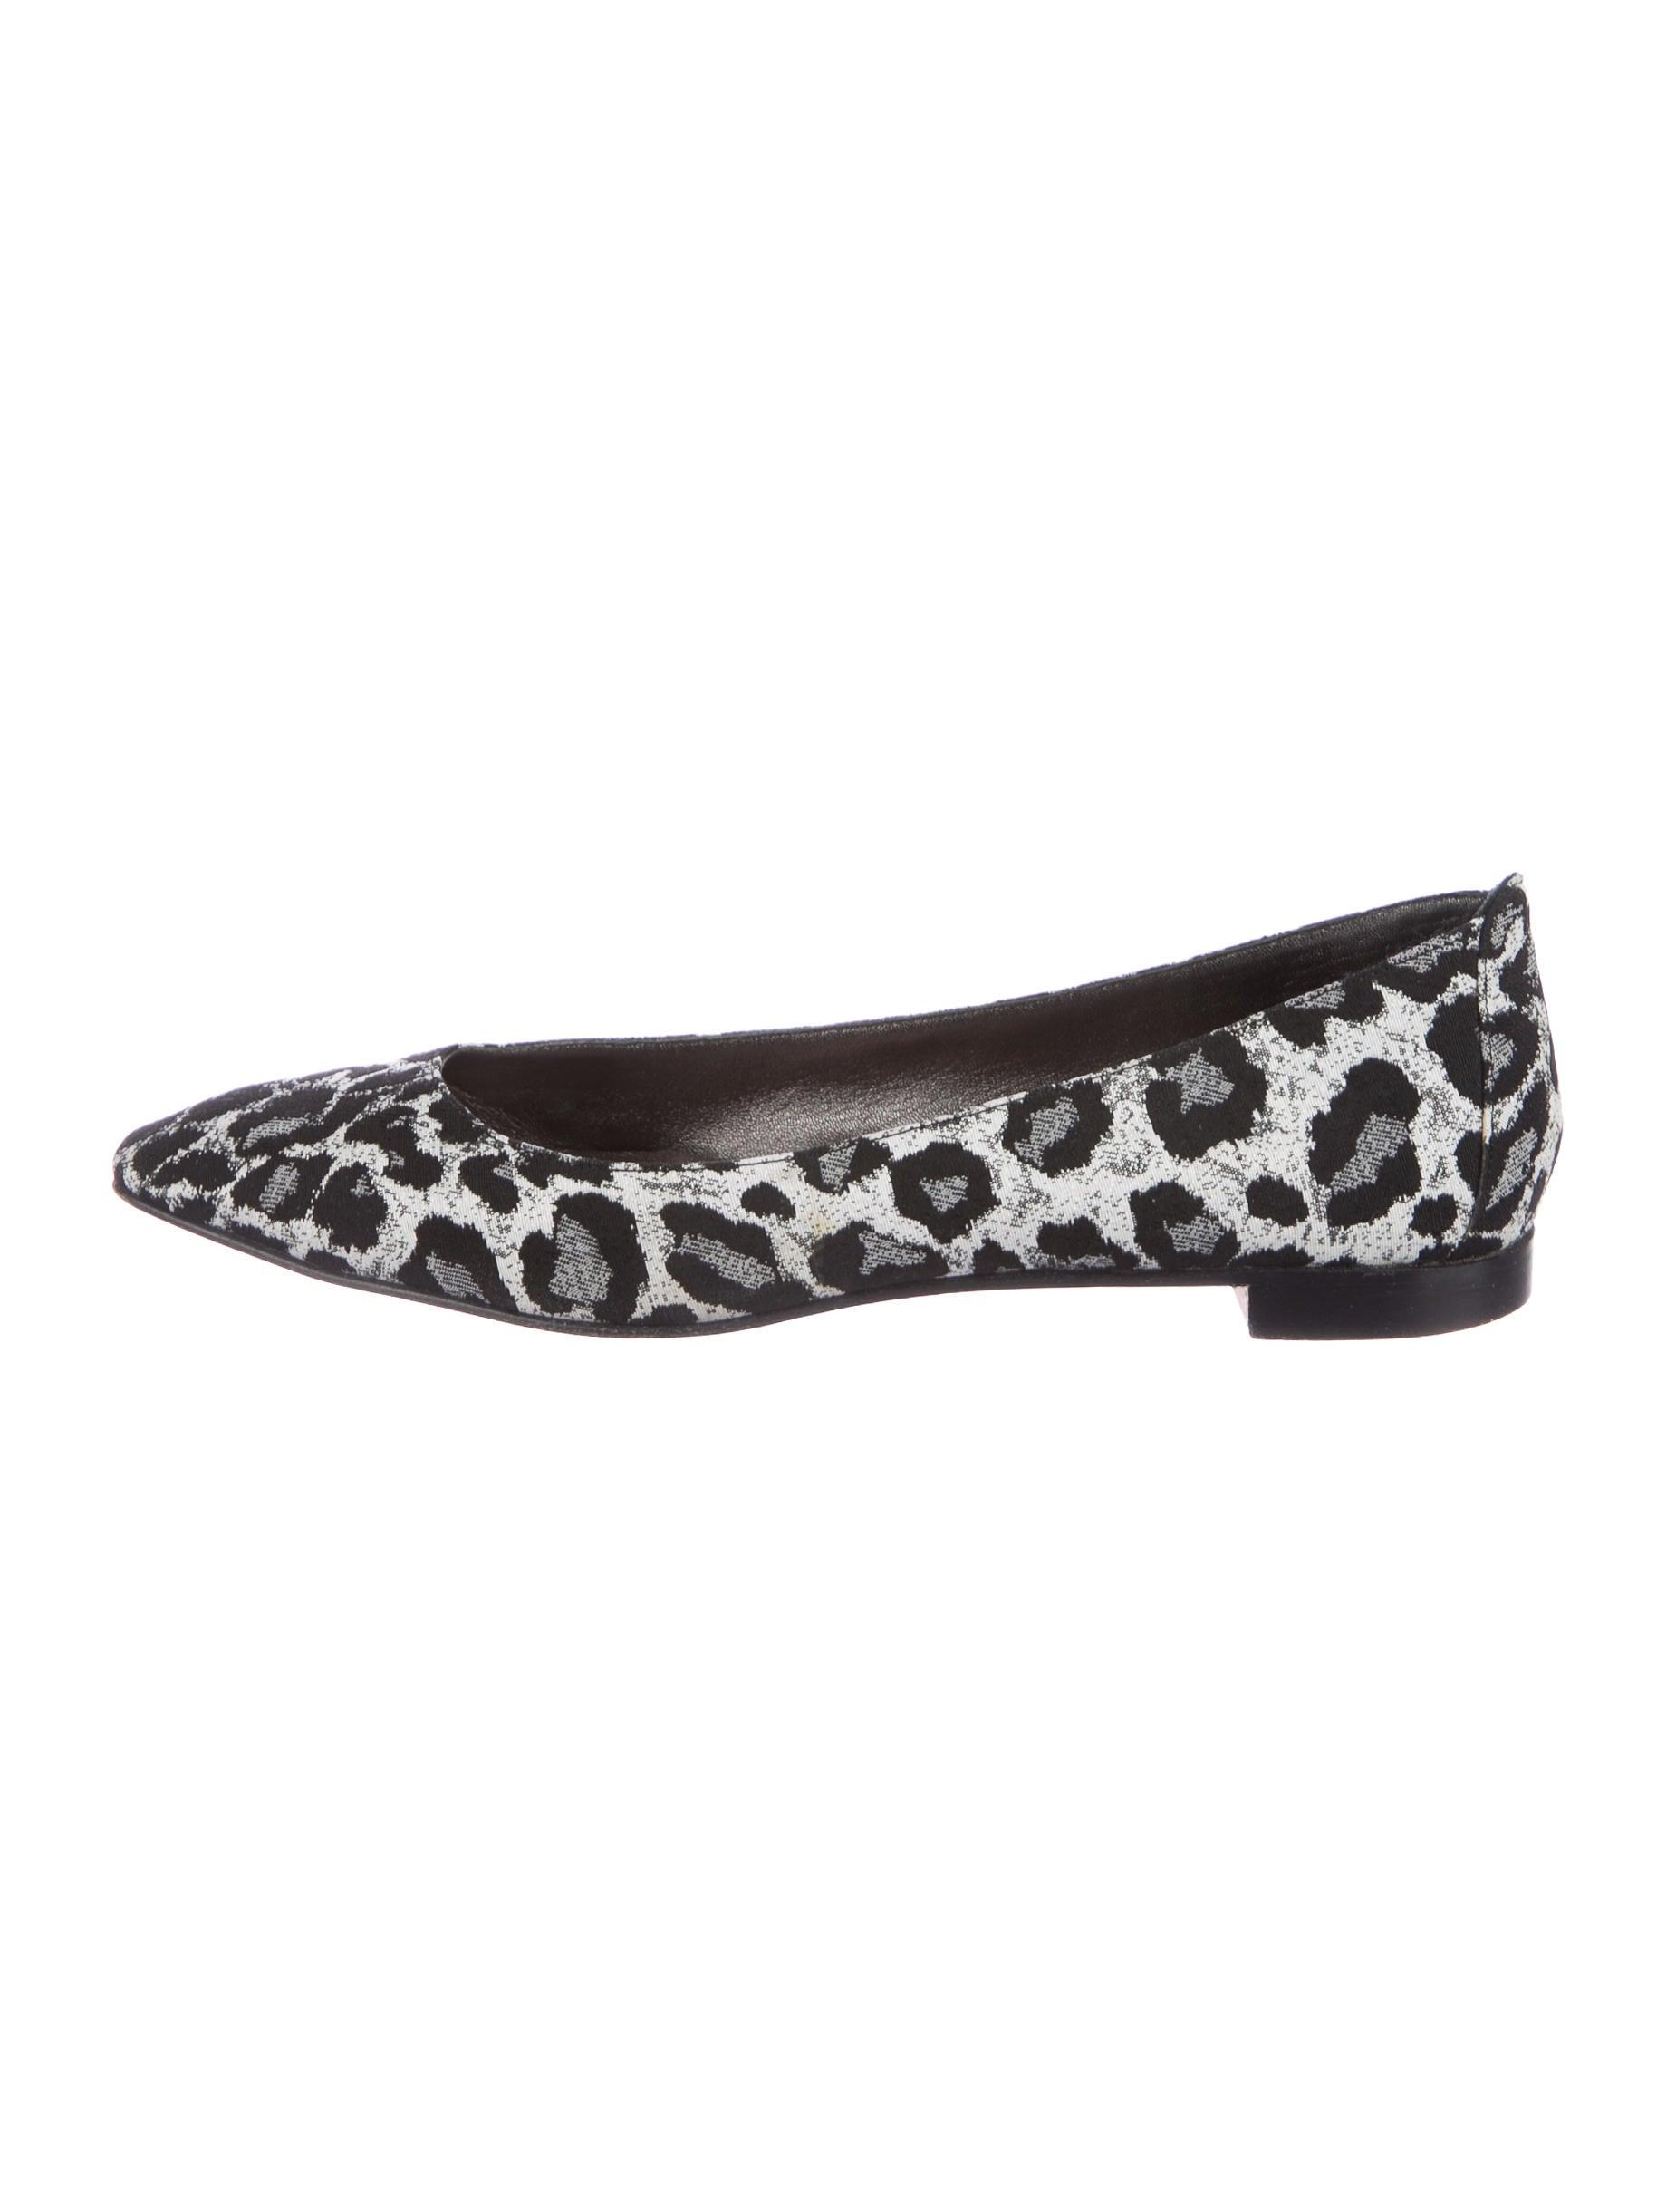 high quality cheap online Manolo Blahnik Canvas Round-Toe Flats buy cheap big discount ybqAaswMBQ